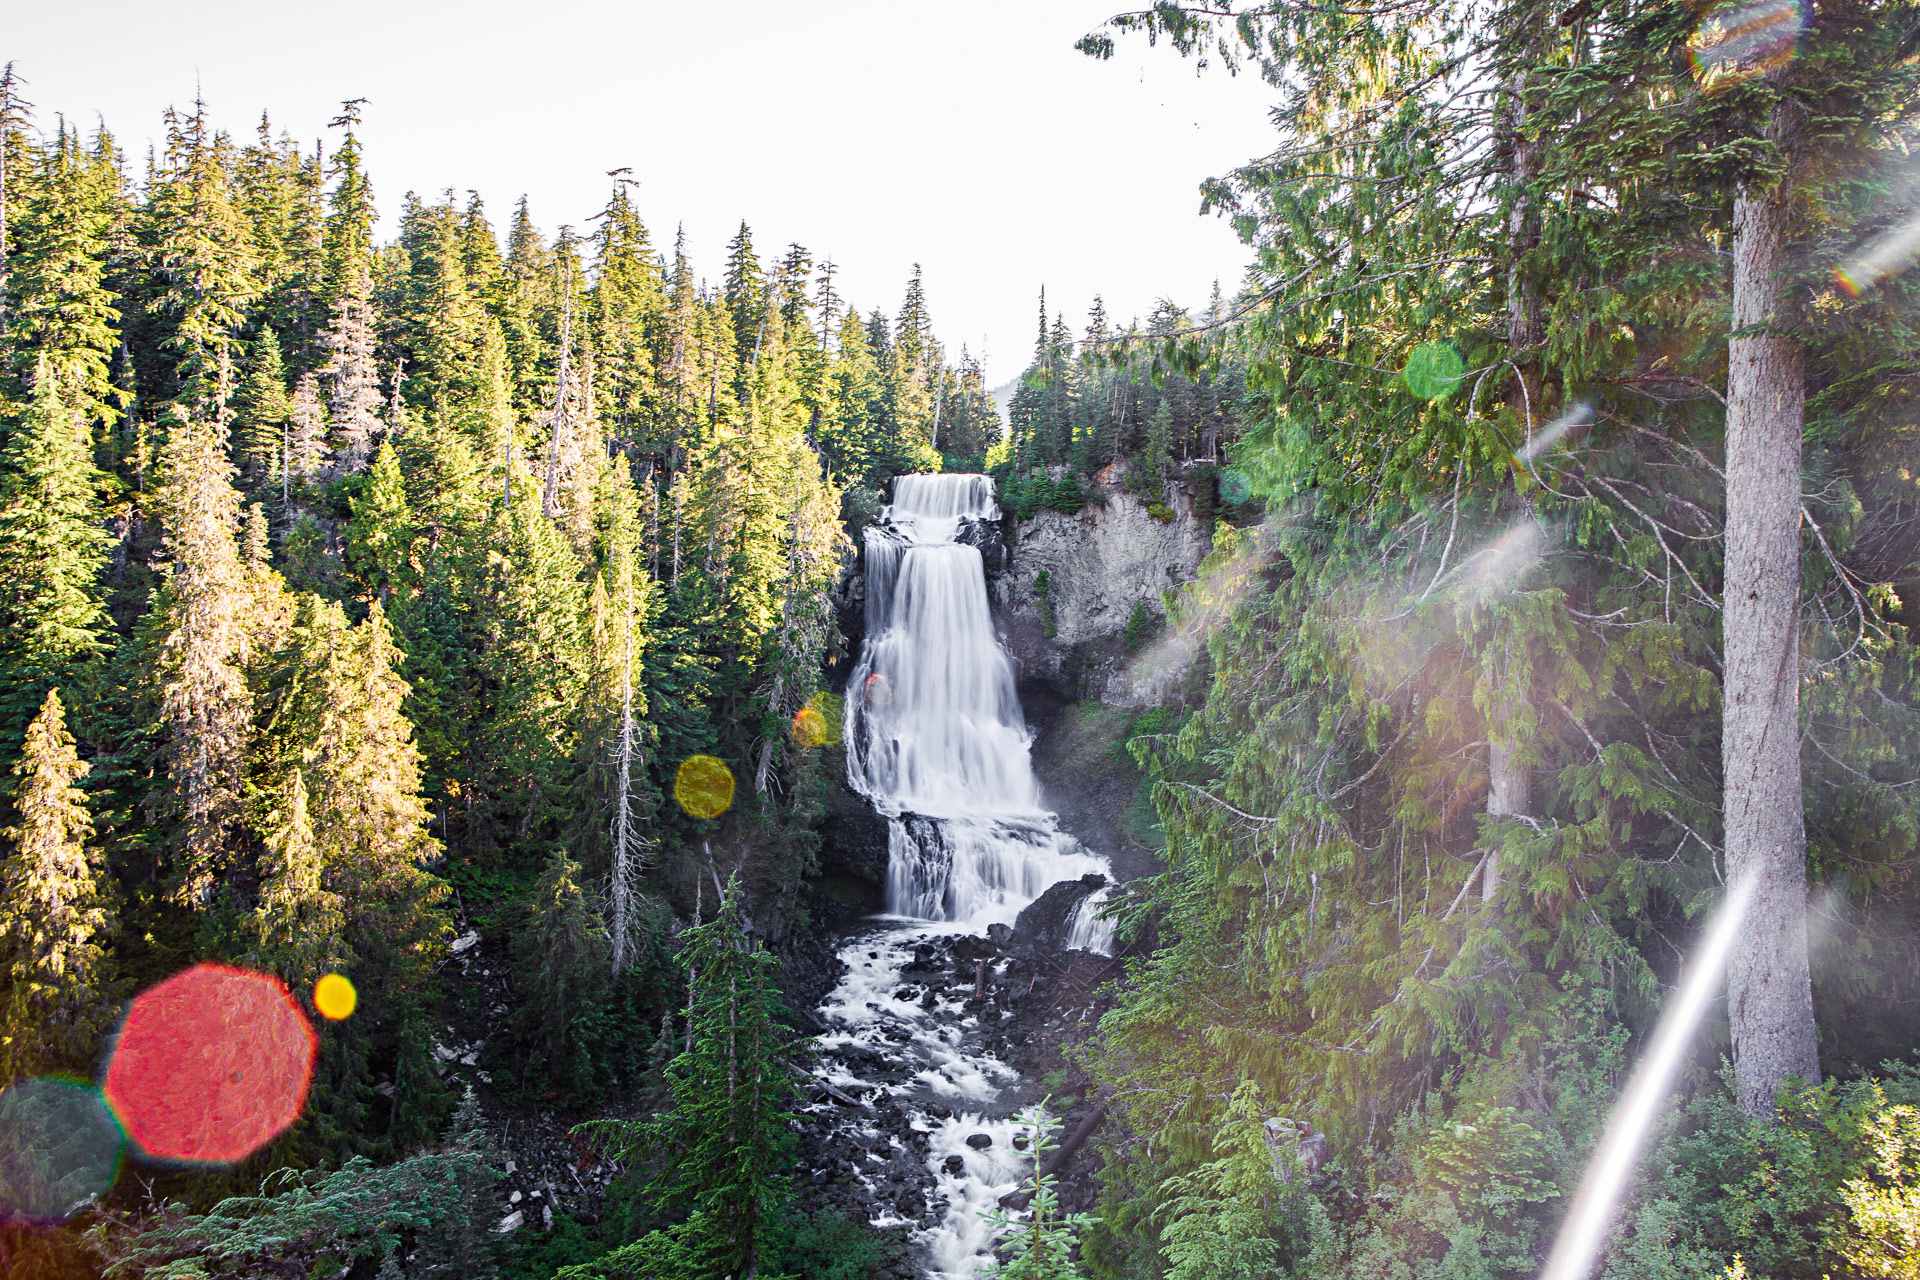 Alexander Falls Colombie-Britannique Canada